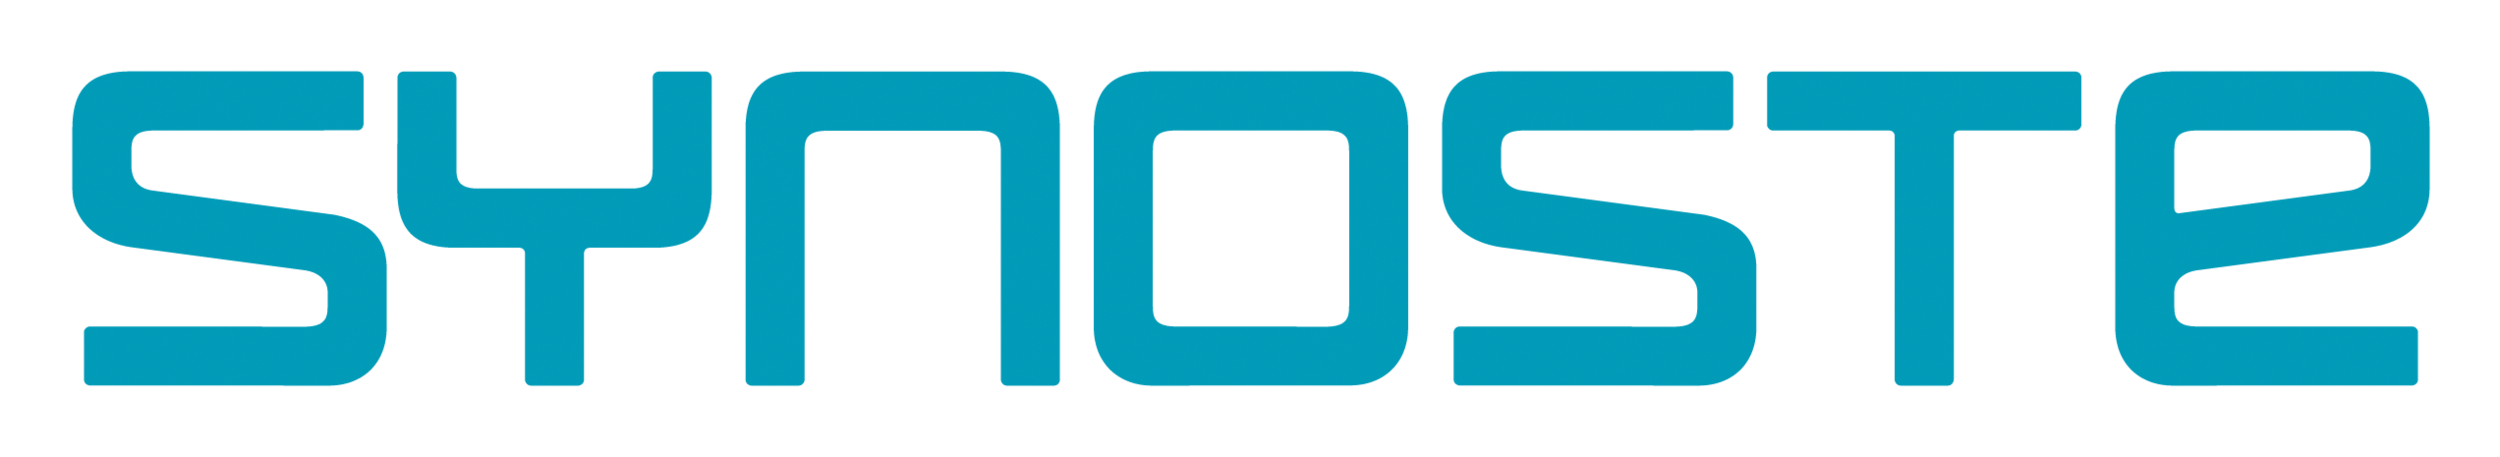 Synoste Logo Clear Zone Blue_14.6.15 - Harri Hallila.png